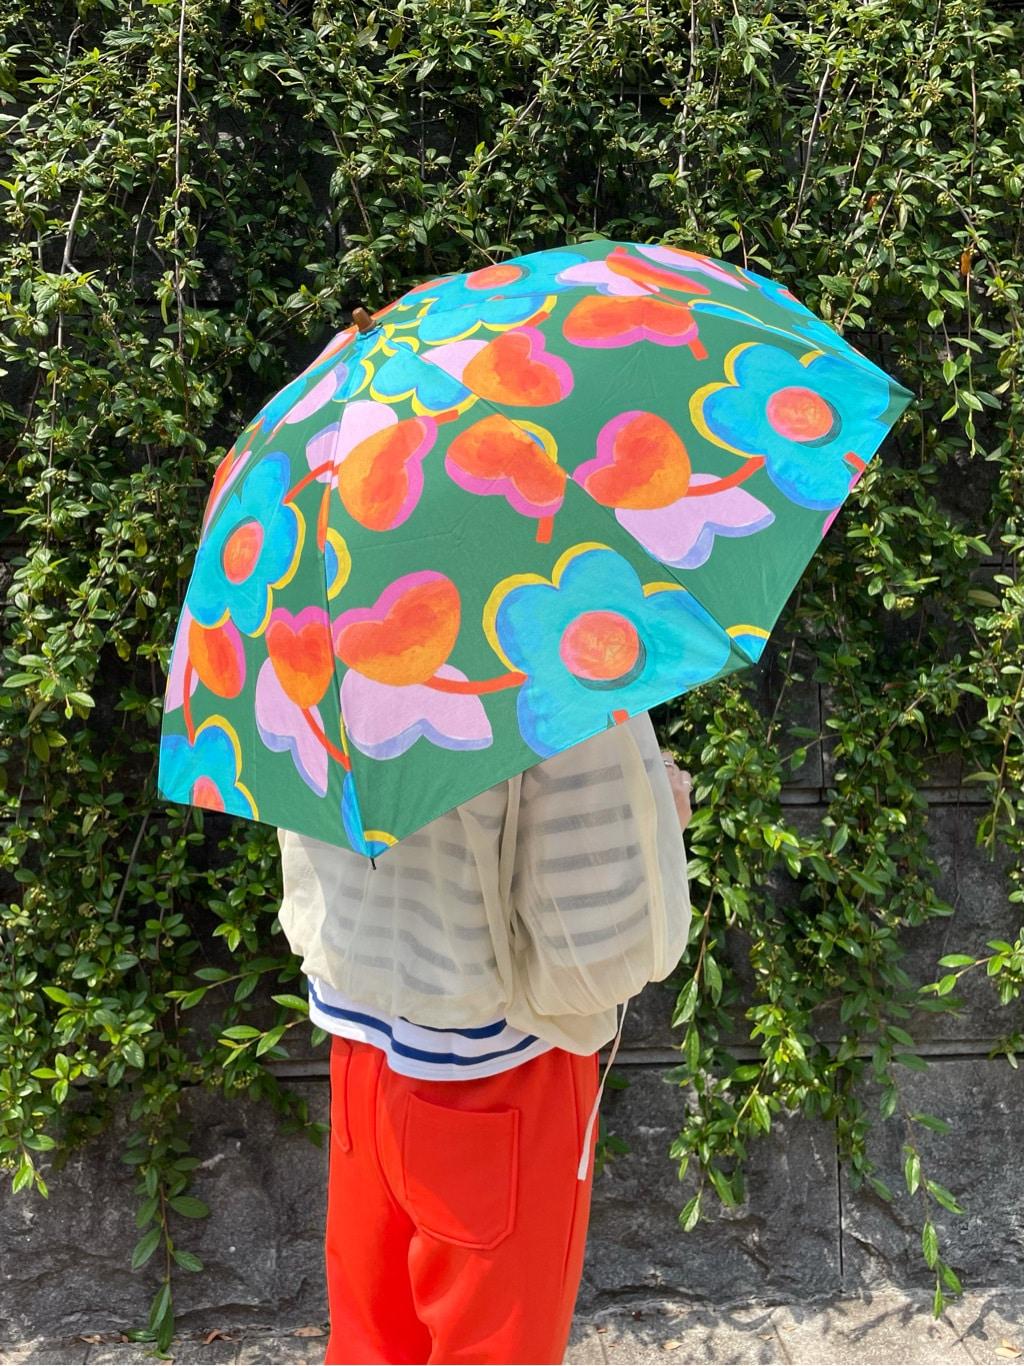 - CHILD WOMAN CHILD WOMAN , PAR ICI 東京スカイツリータウン・ソラマチ 身長:160cm 2021.06.10